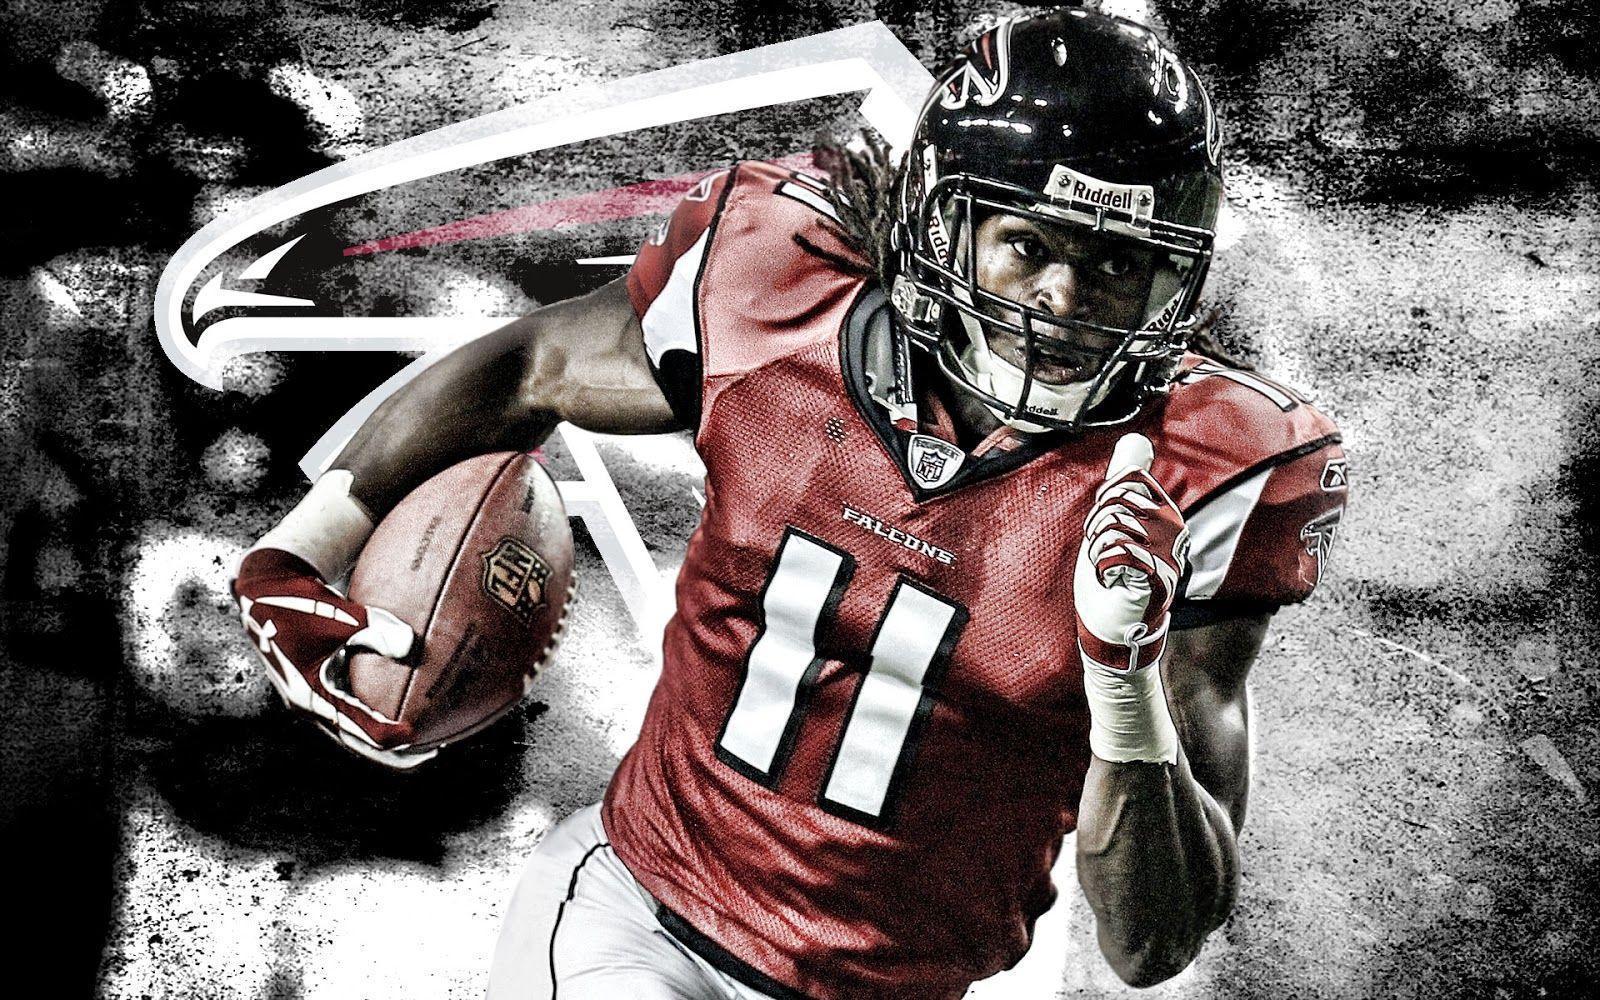 Atlanta Falcons 2018 Wallpaper Hd 64 Images: Atlanta Falcons Desktop Wallpapers